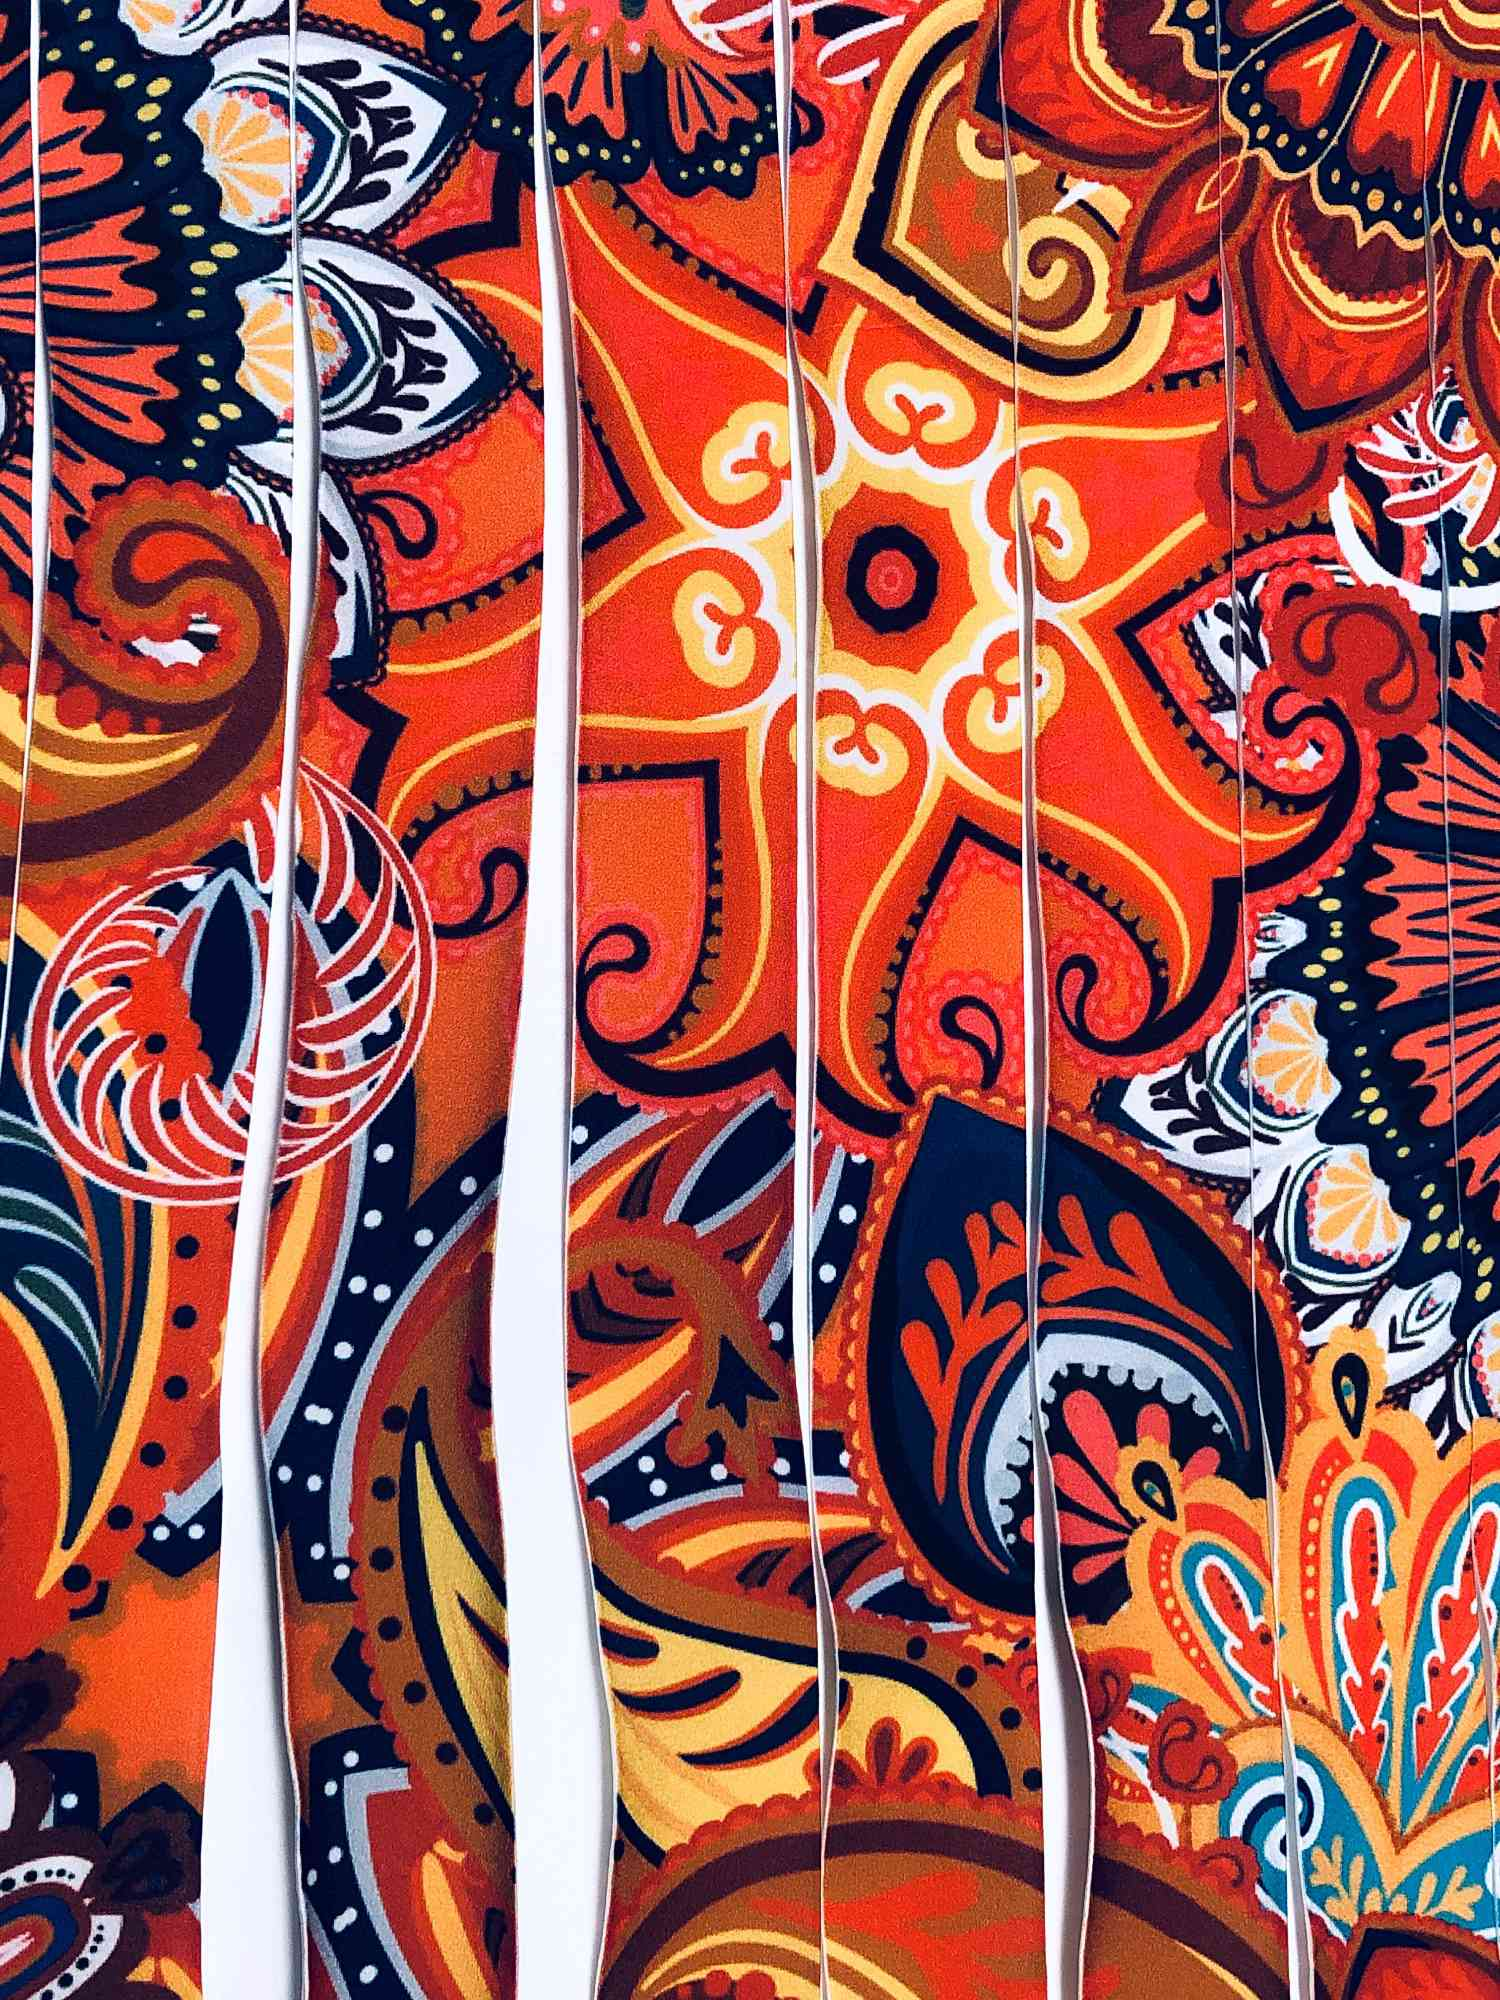 Printed Fabrics - racan 7174 - RACAN 7174 Polyester